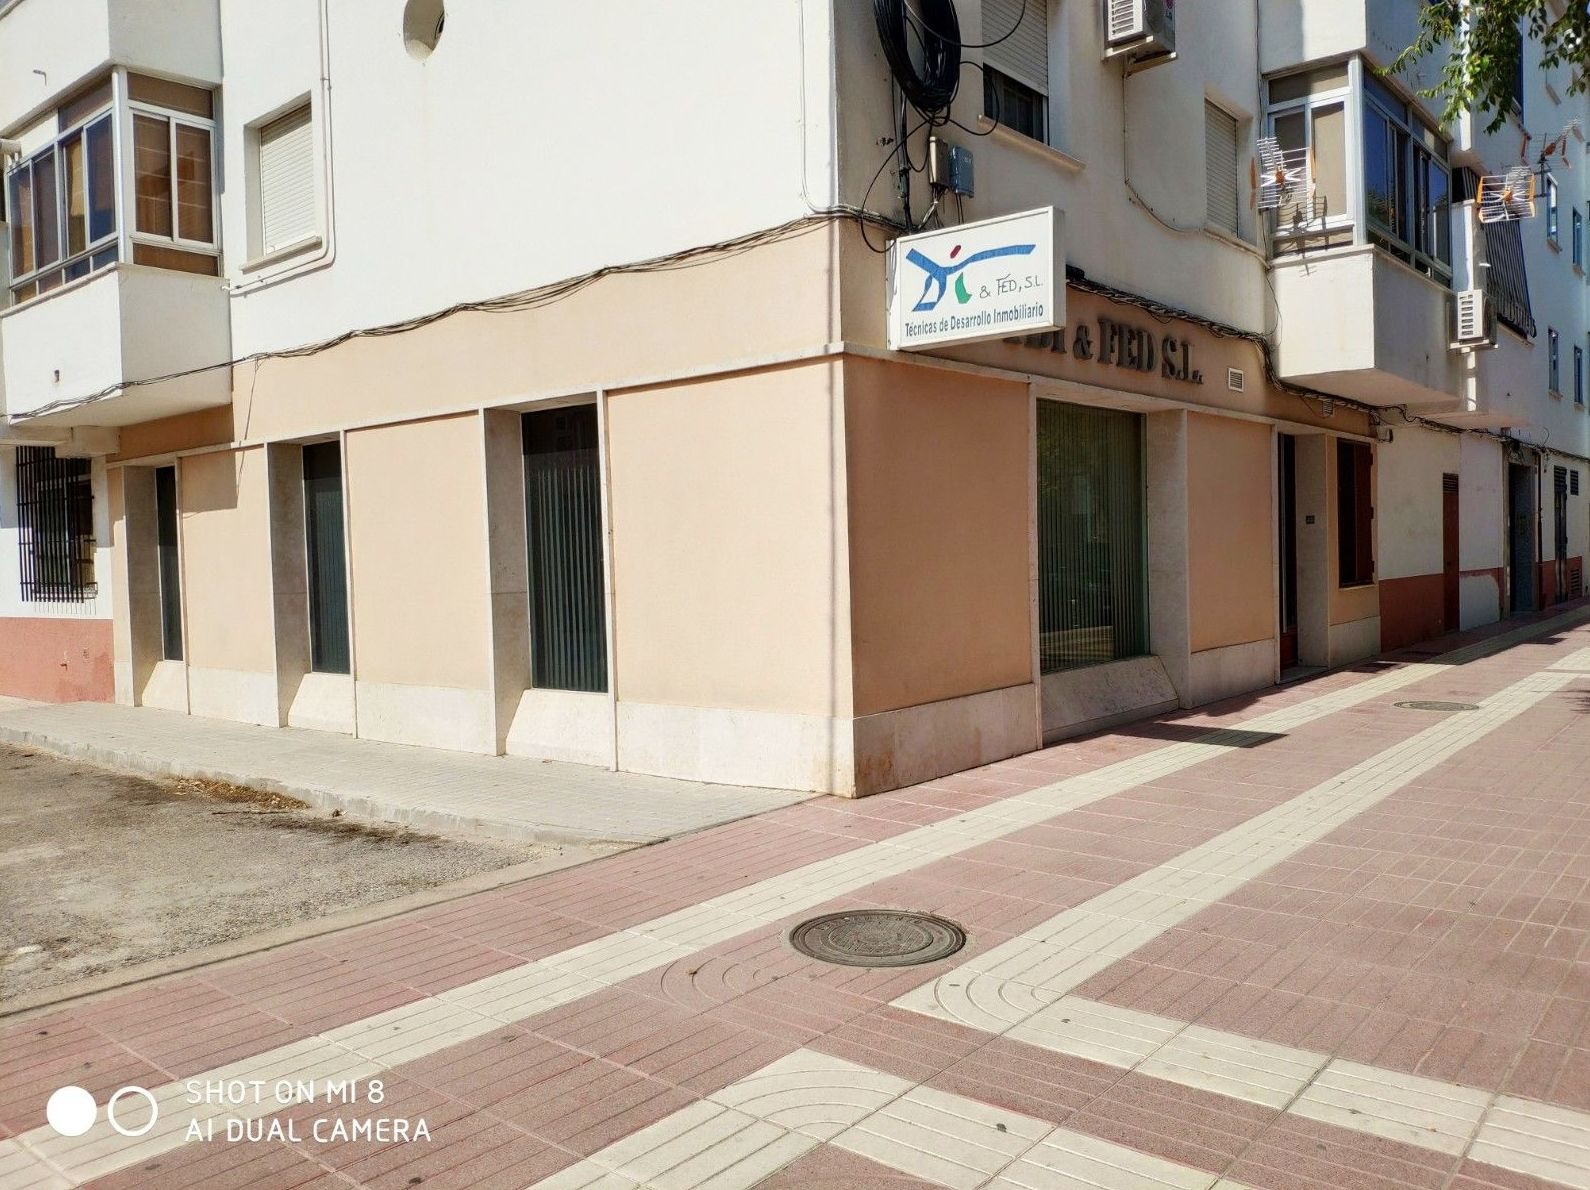 LOCAL COMERCIAL/OFICINA AVDA. ALCAZAR: Inmuebles Urbanos de ANTONIO ARAGONÉS DÍAZ PAVÓN